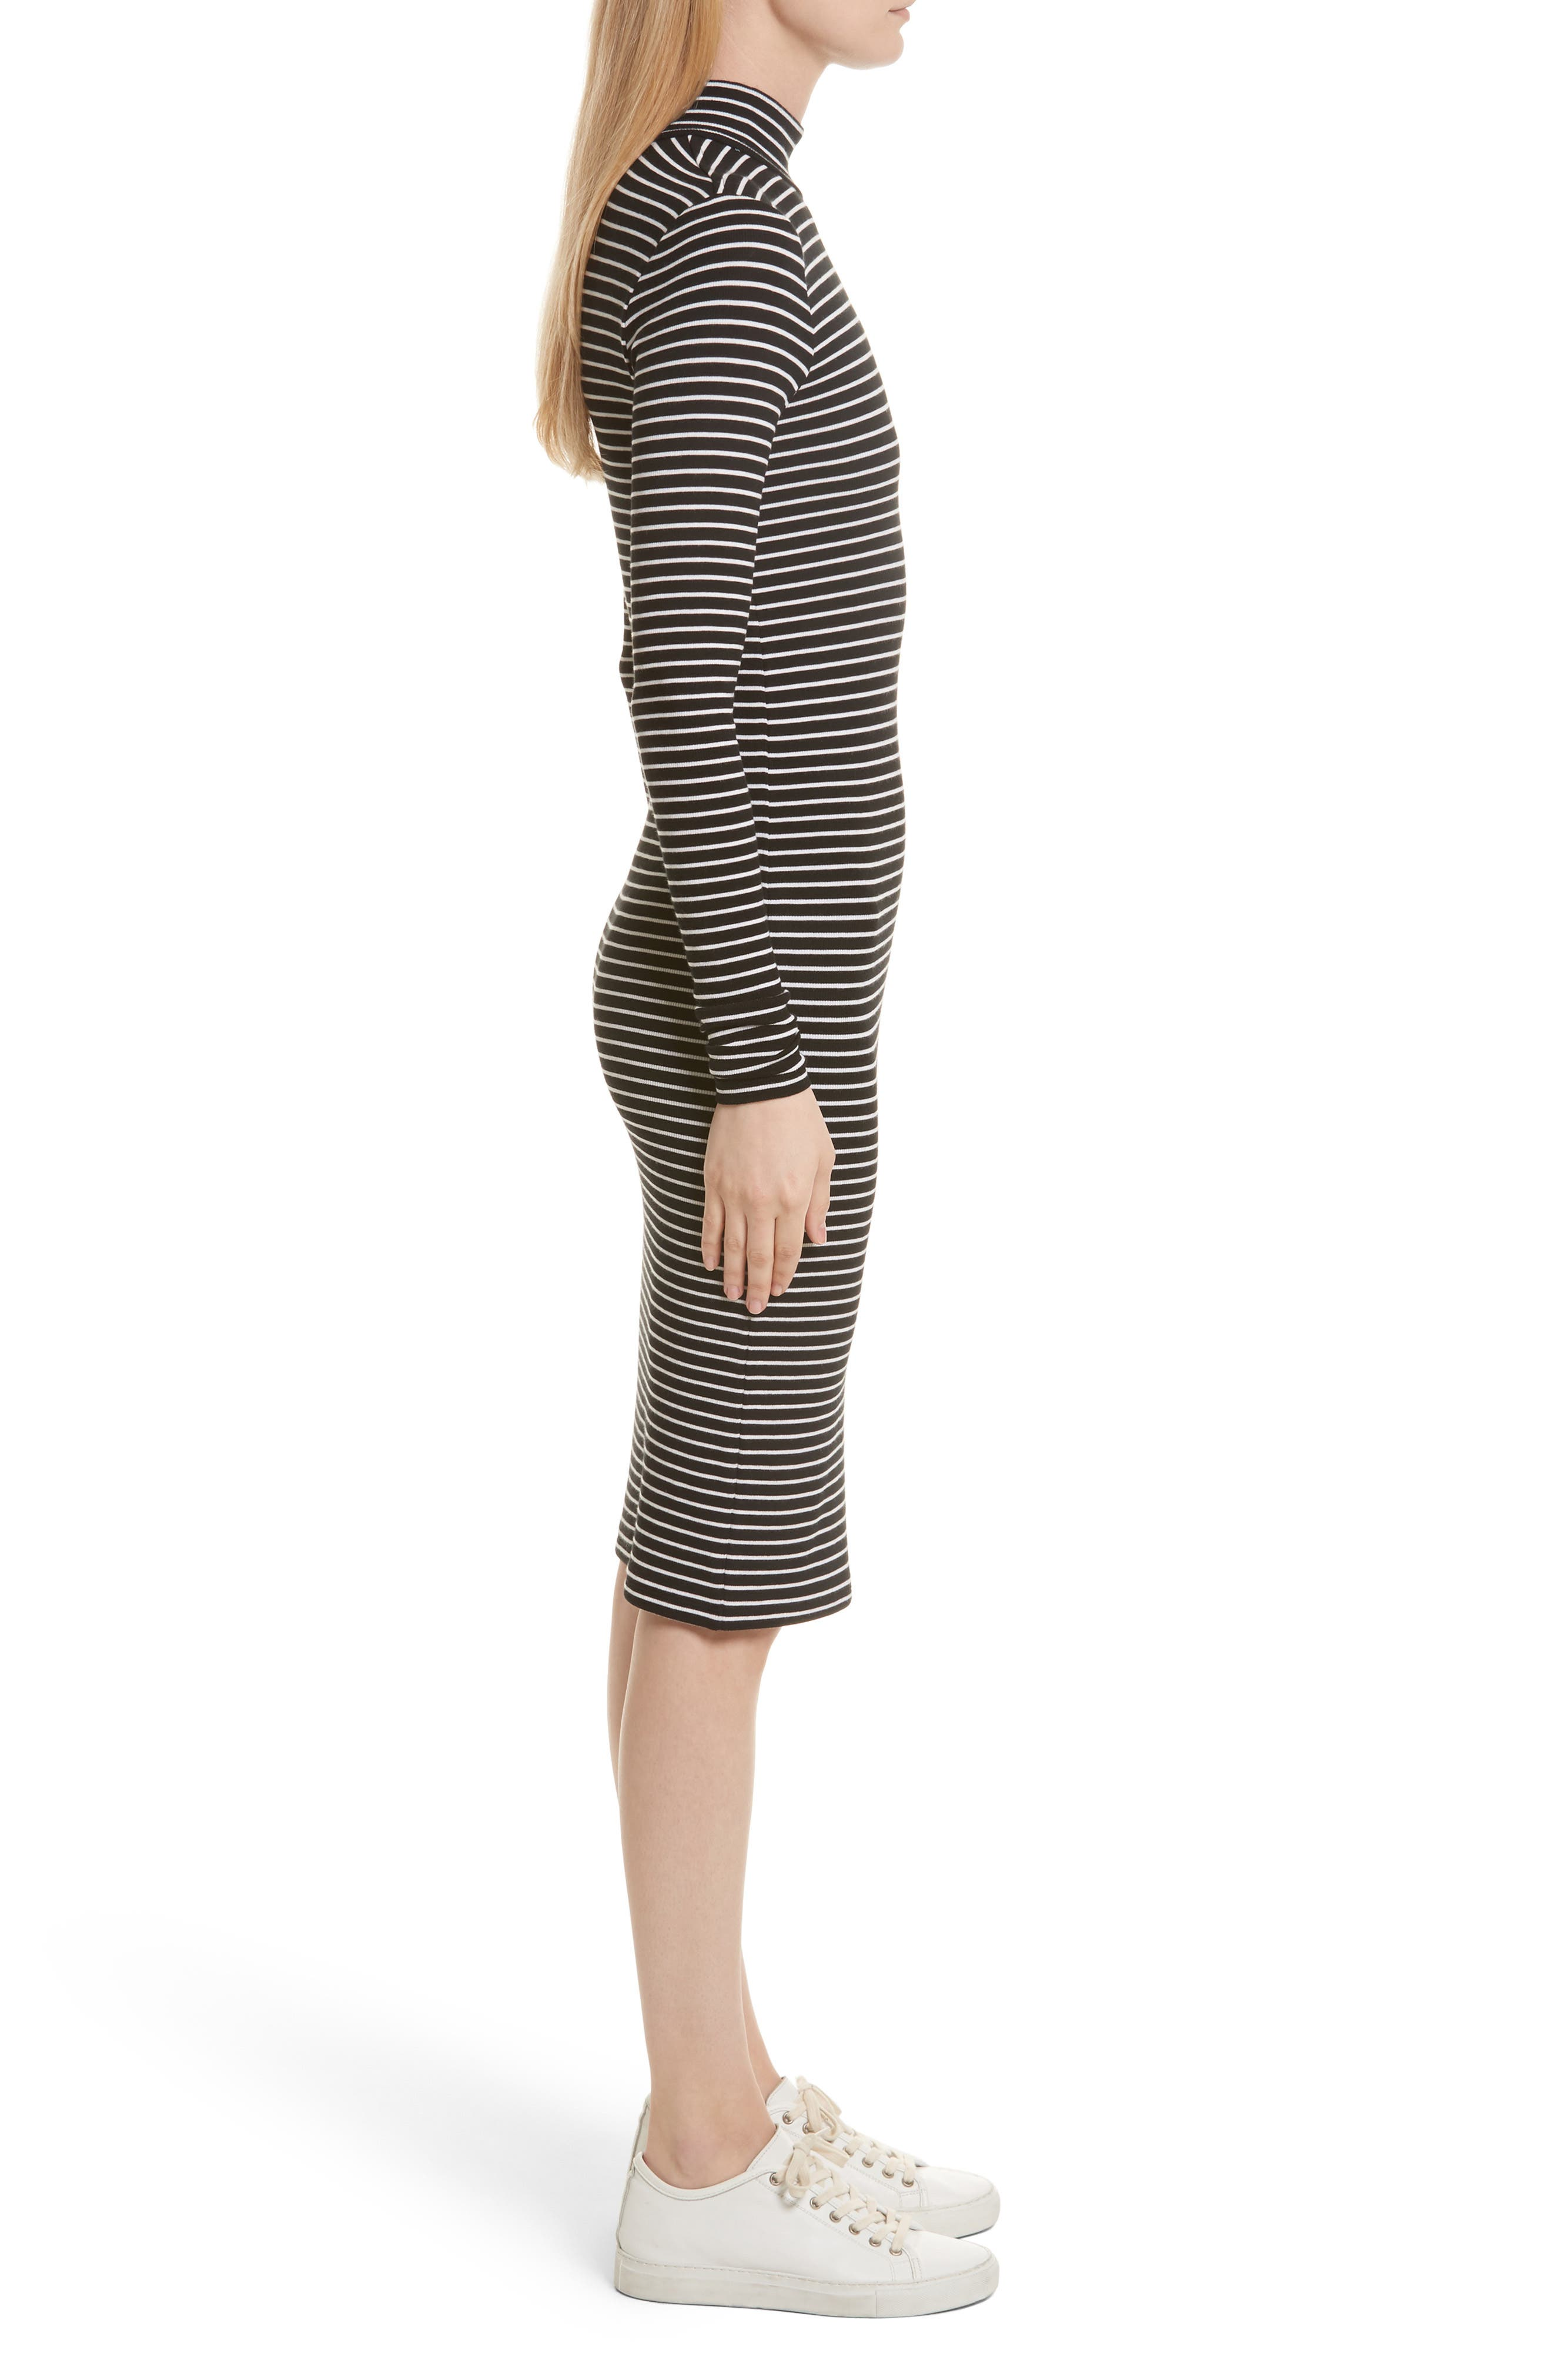 Alternate Image 2  - ATM Anthony Thomas Melillo Stripe Rib Jersey Dress (Nordstrom Exclusive)